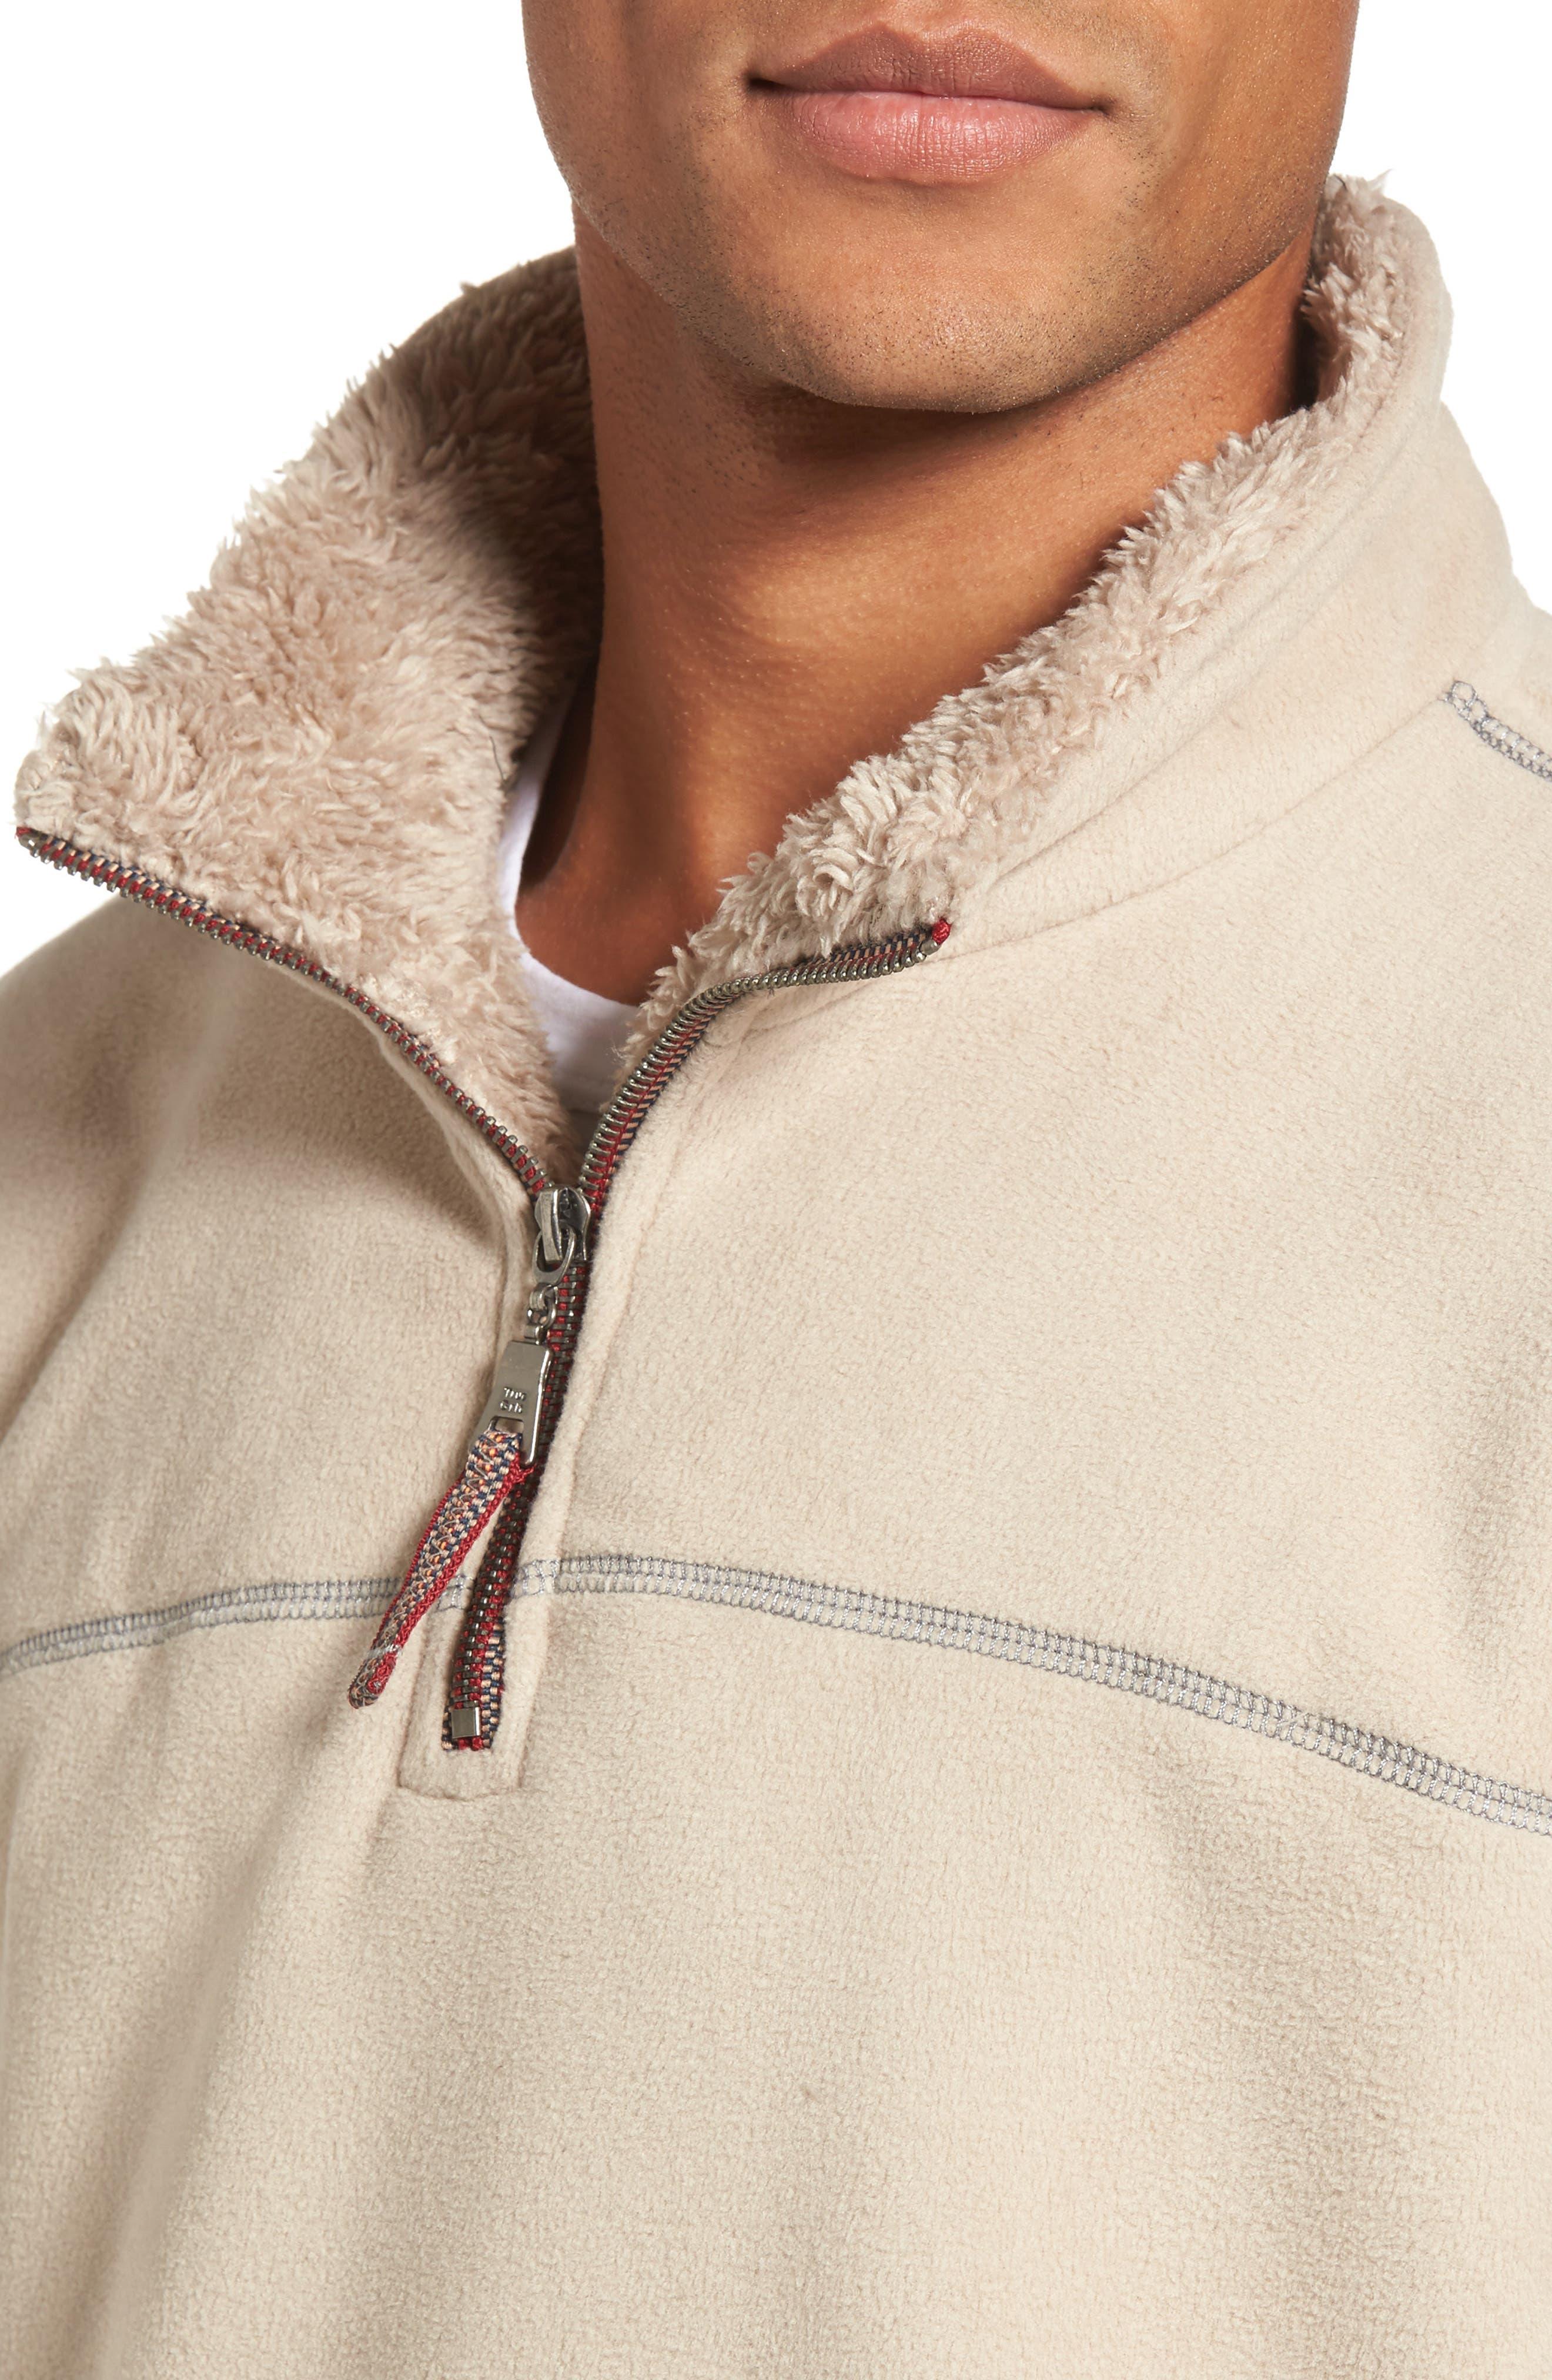 Bonded Polar Fleece Lined Pullover,                             Alternate thumbnail 4, color,                             Sand